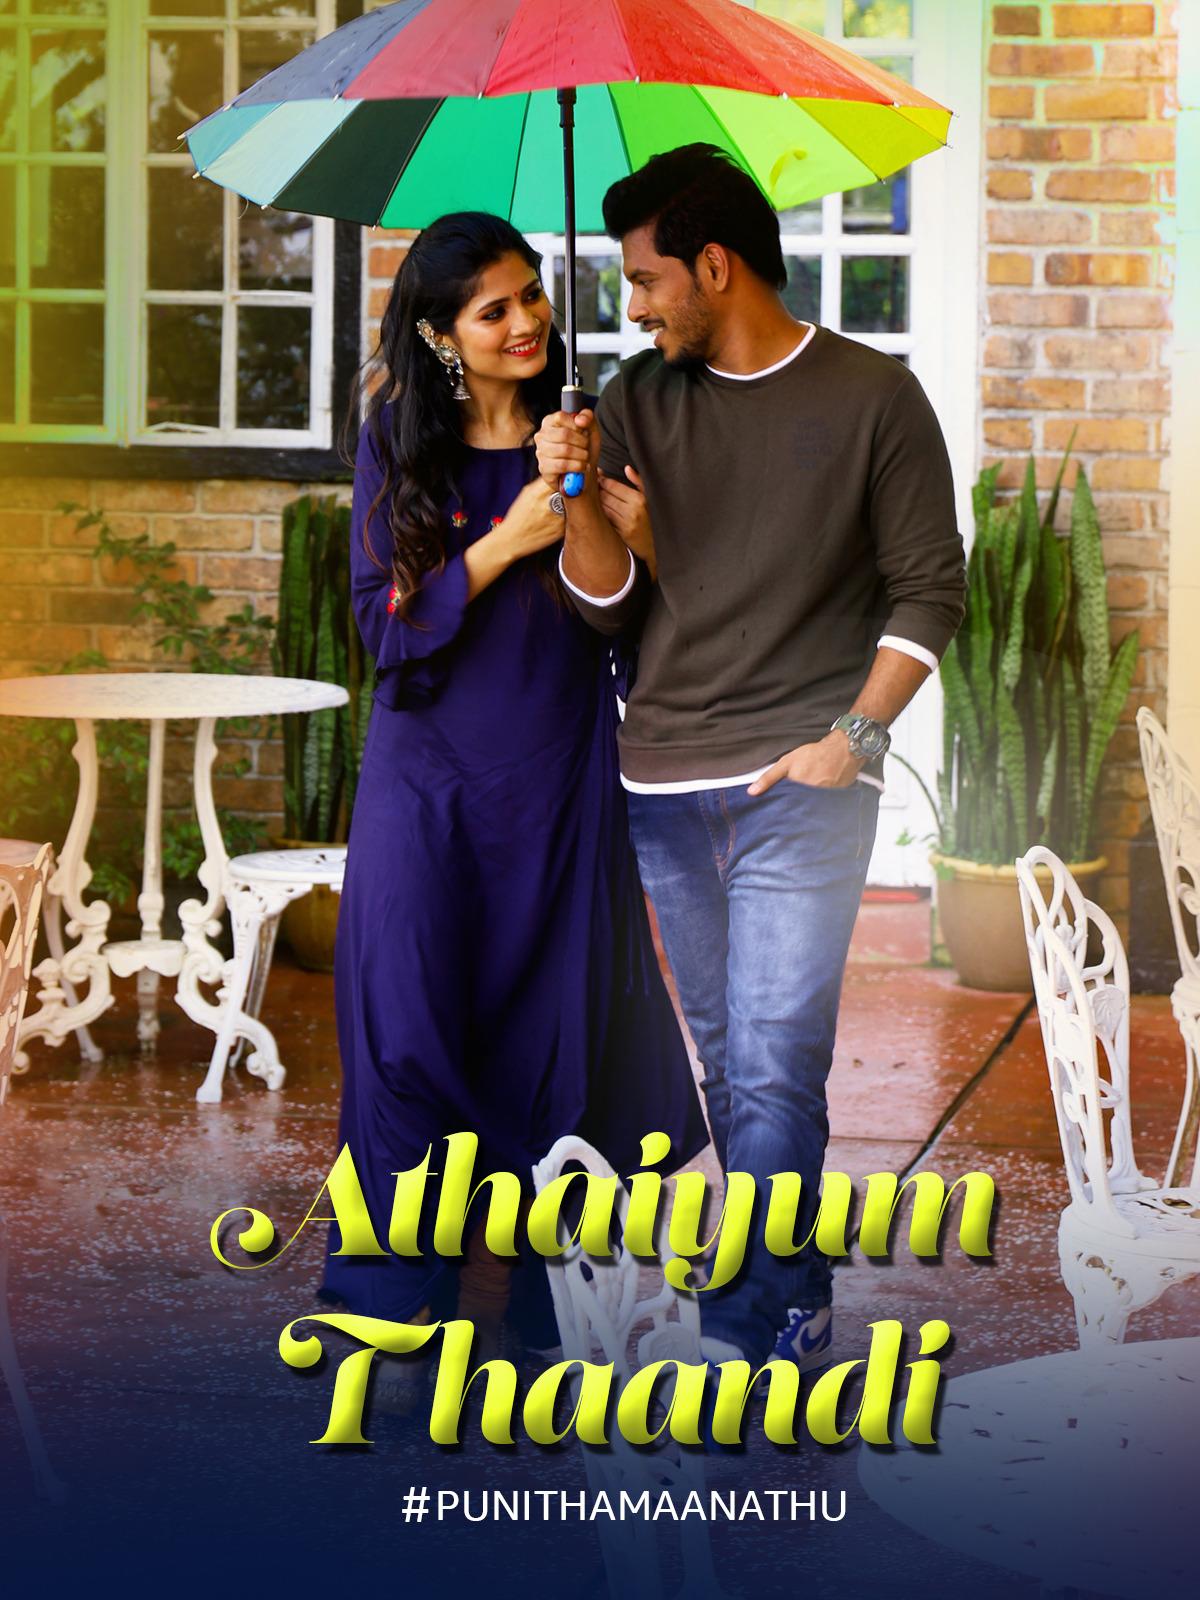 Athaiyum Thaandi Punithamaanathu 2021 Tamil 720p HDRip ESub 1.1GB Free Download